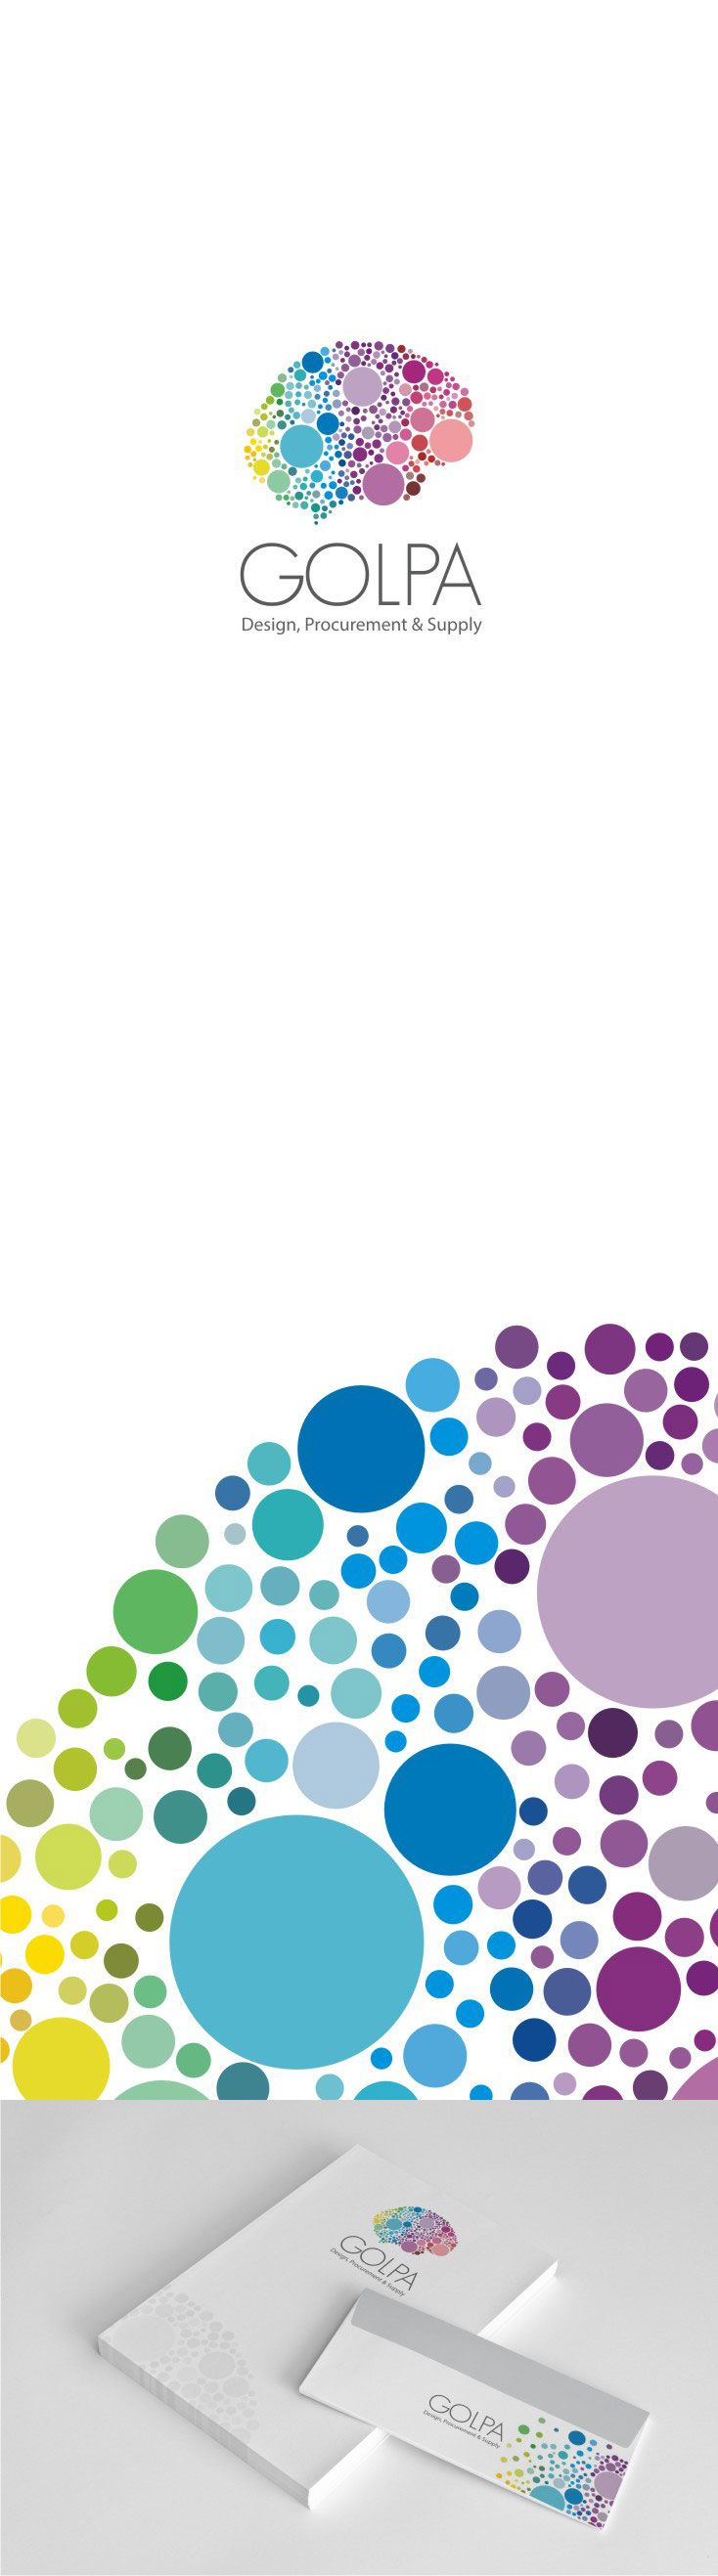 Brain Logo Design by Majid Abparvar www.lotusstudio.co